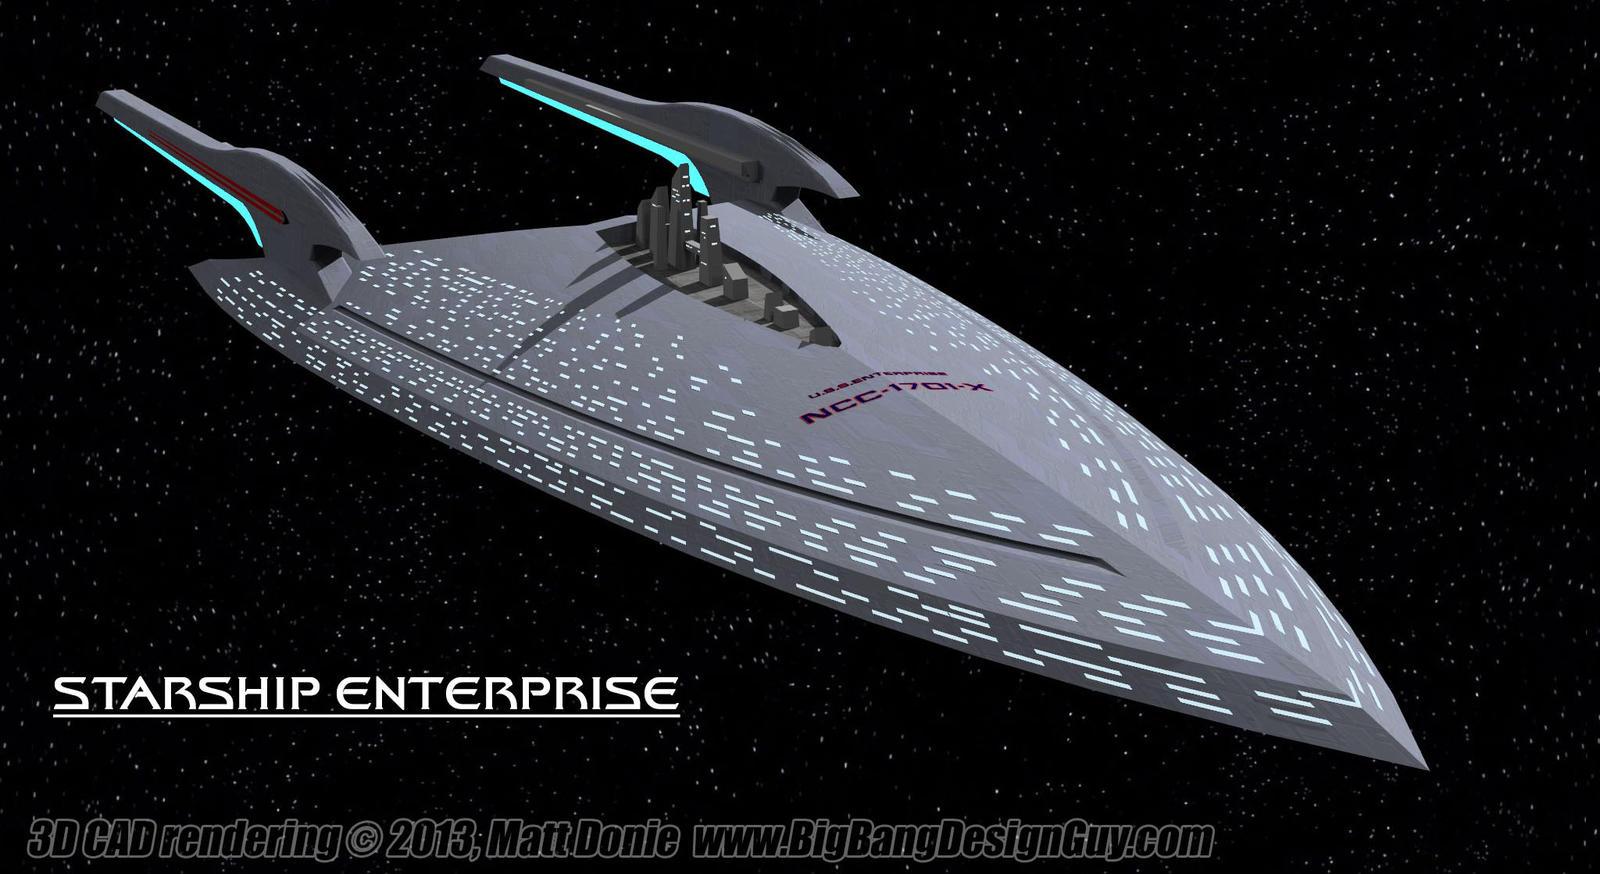 star trek future starship - photo #26